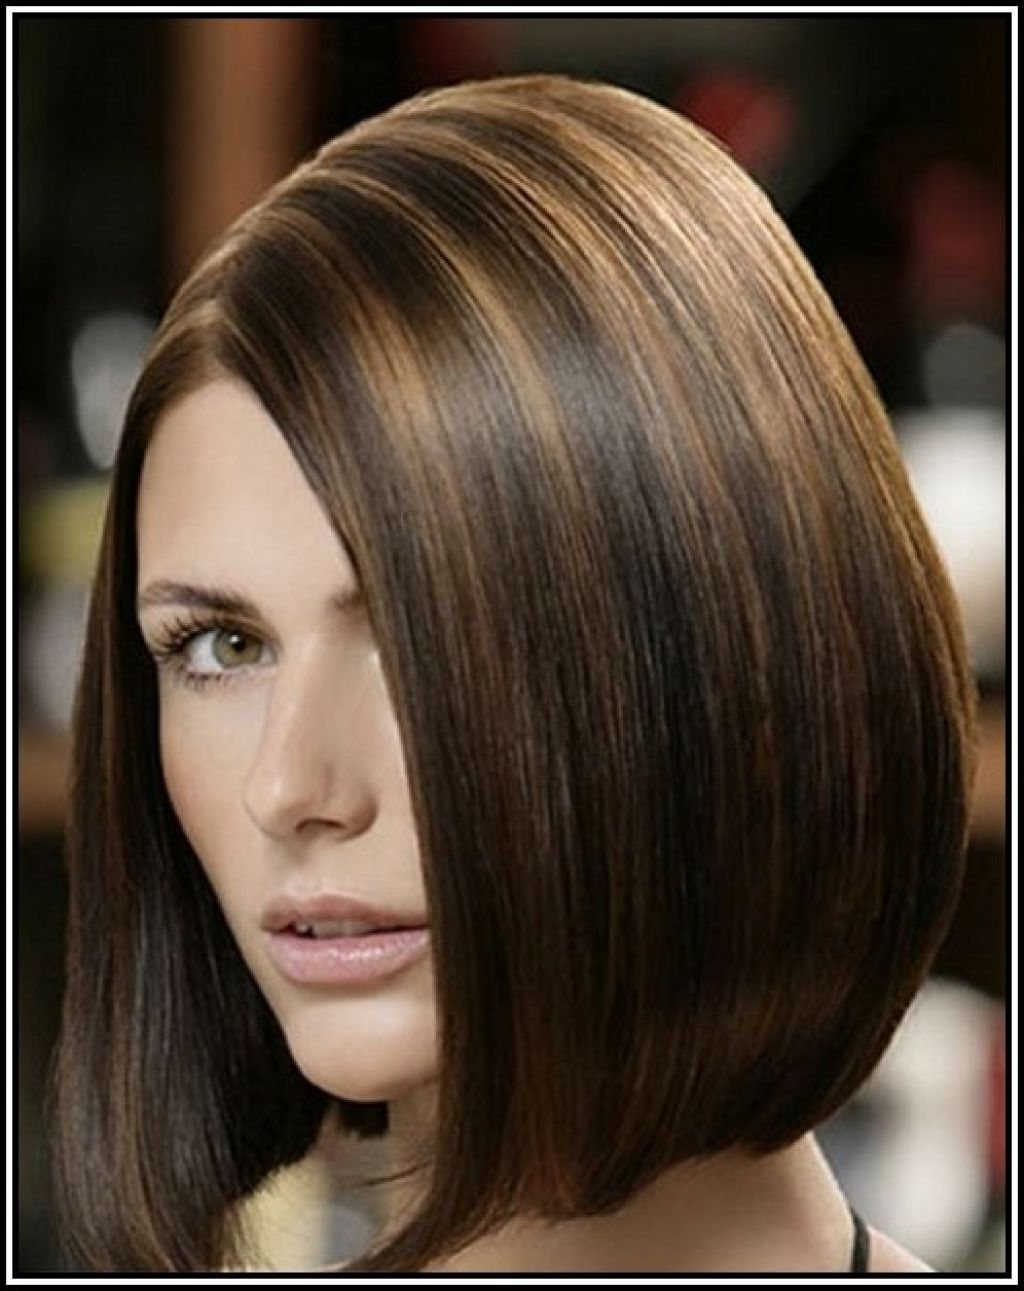 Short light brown hair with caramel highlights hairstyles hair short light brown hair with caramel highlights hairstyles pmusecretfo Choice Image